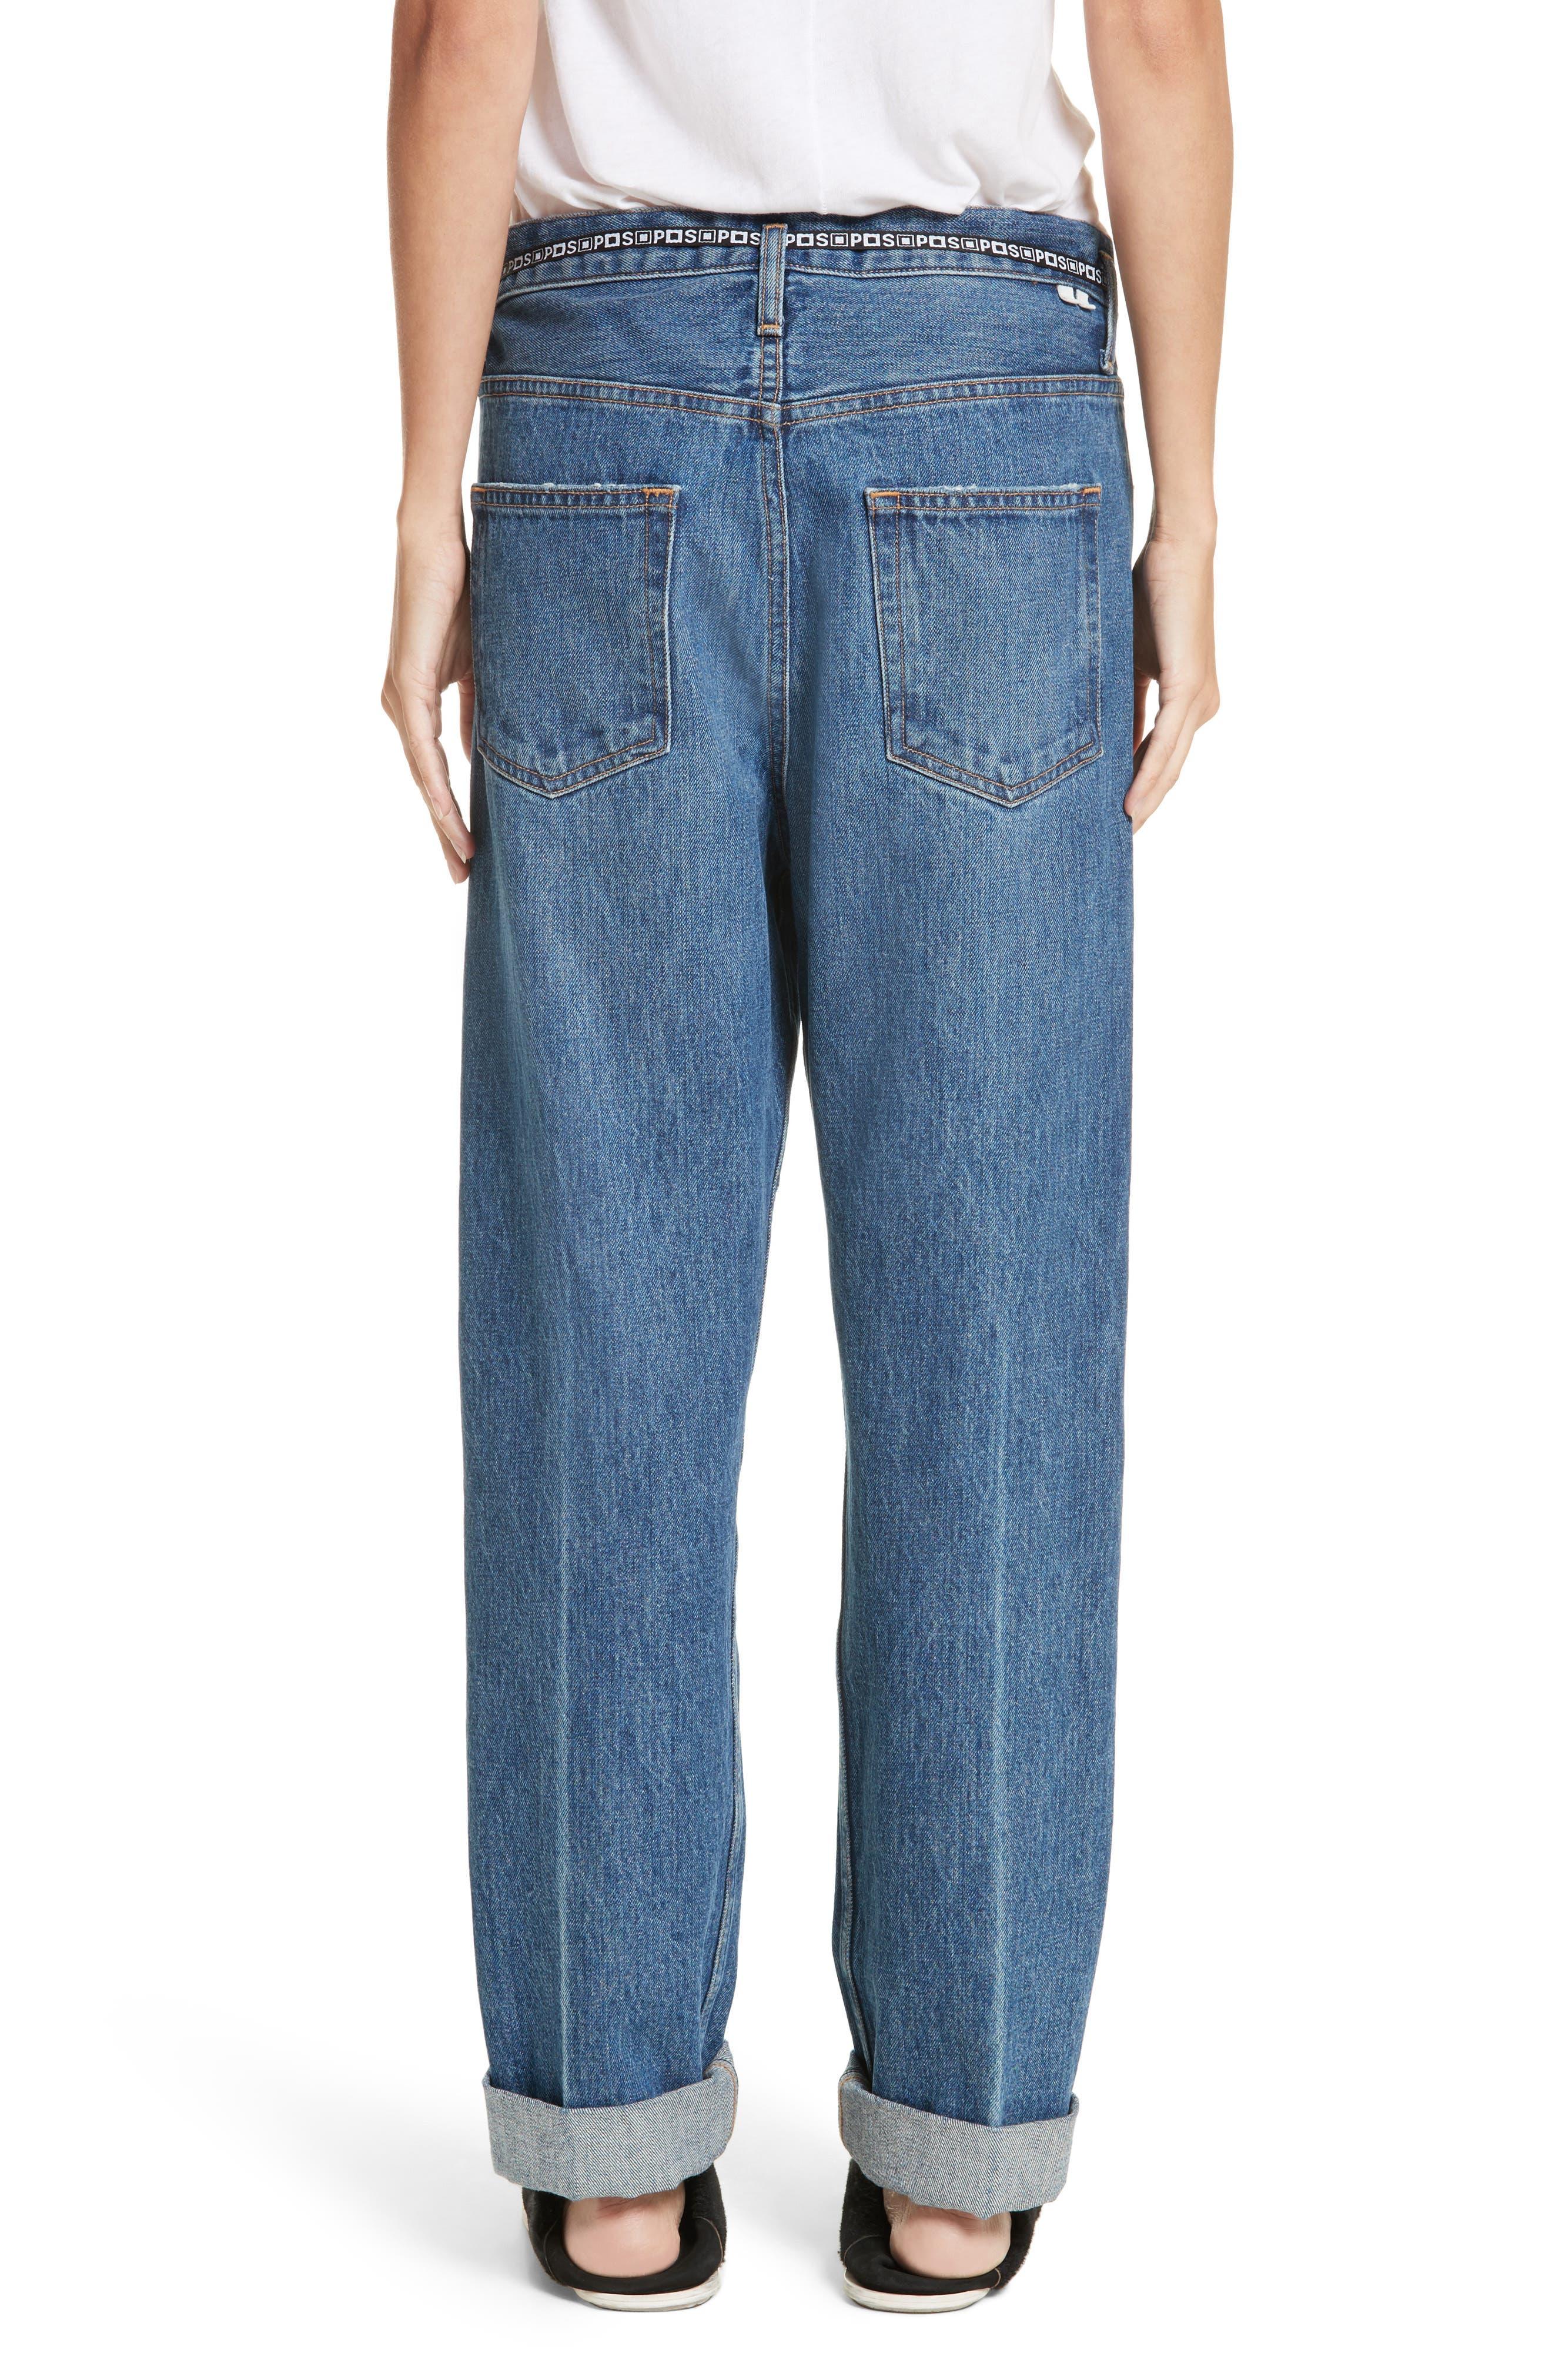 PSWL Cuffed Straight Leg Jeans,                             Alternate thumbnail 3, color,                             Medium Blue